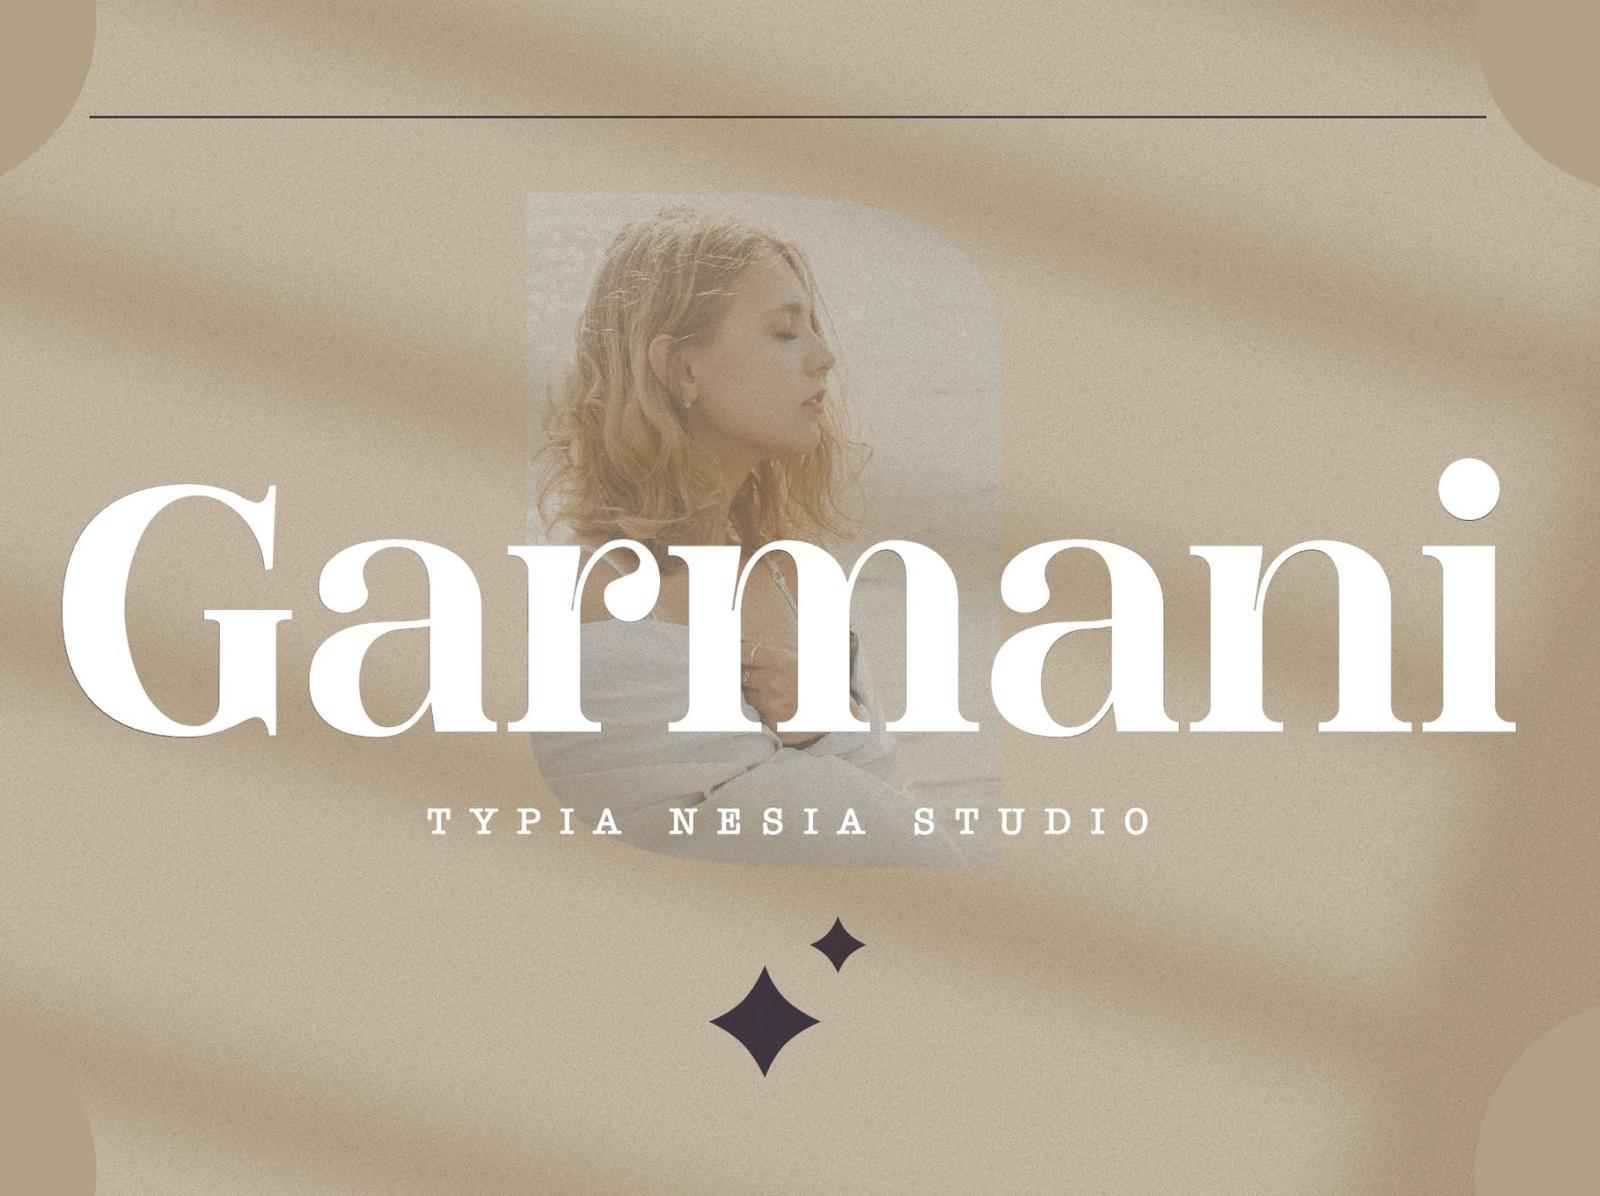 Garmani - Romantic Display Font serif font serif romantic display font ux vector ui logo app typography illustration graphic design design branding